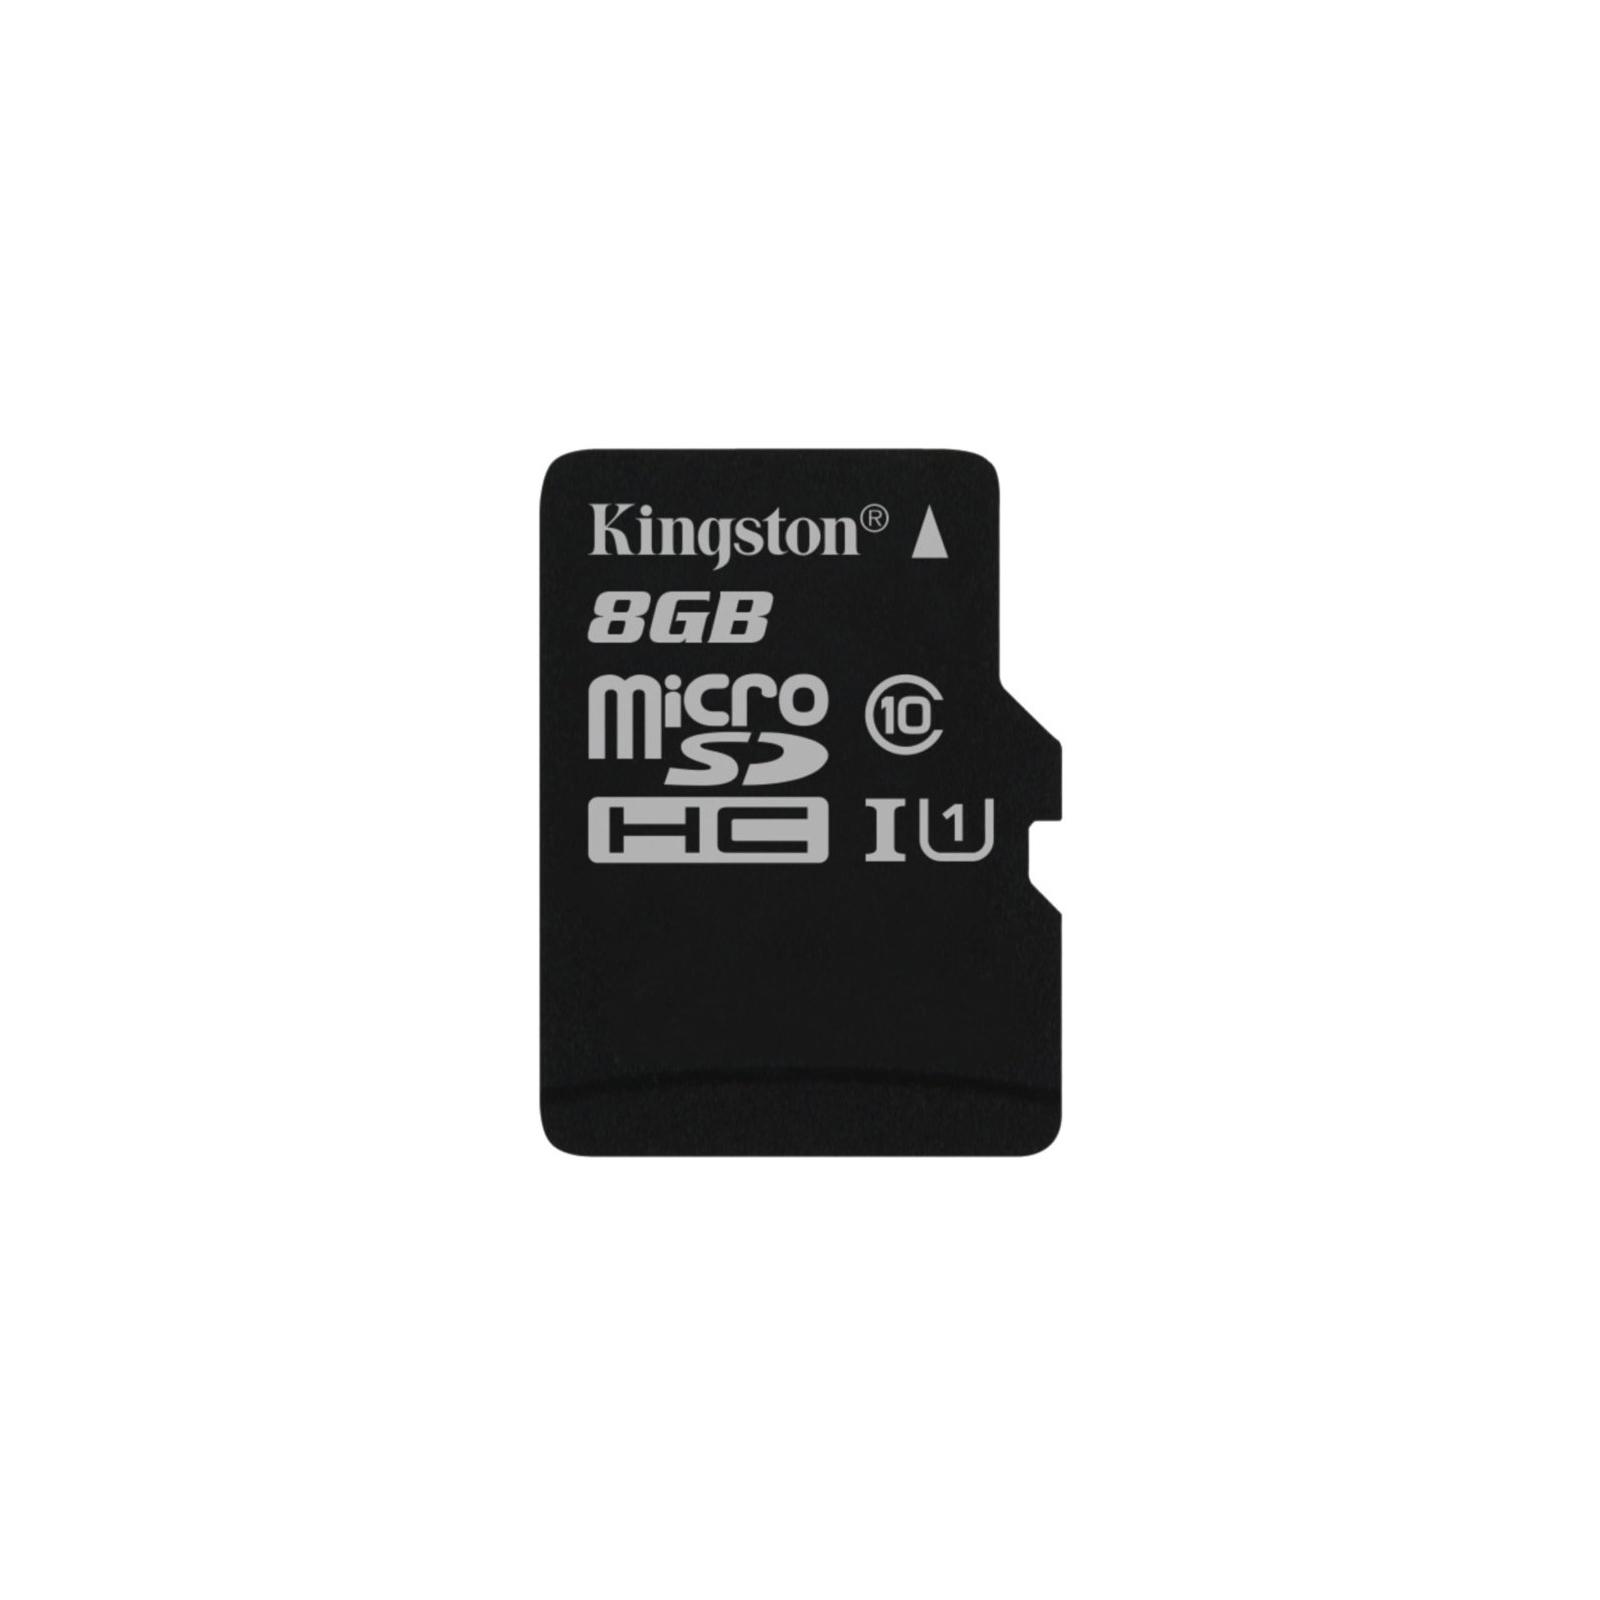 Карта памяти Kingston 8GB microSDXC Class 10 UHS-I (SDC10G2/8GBSP)